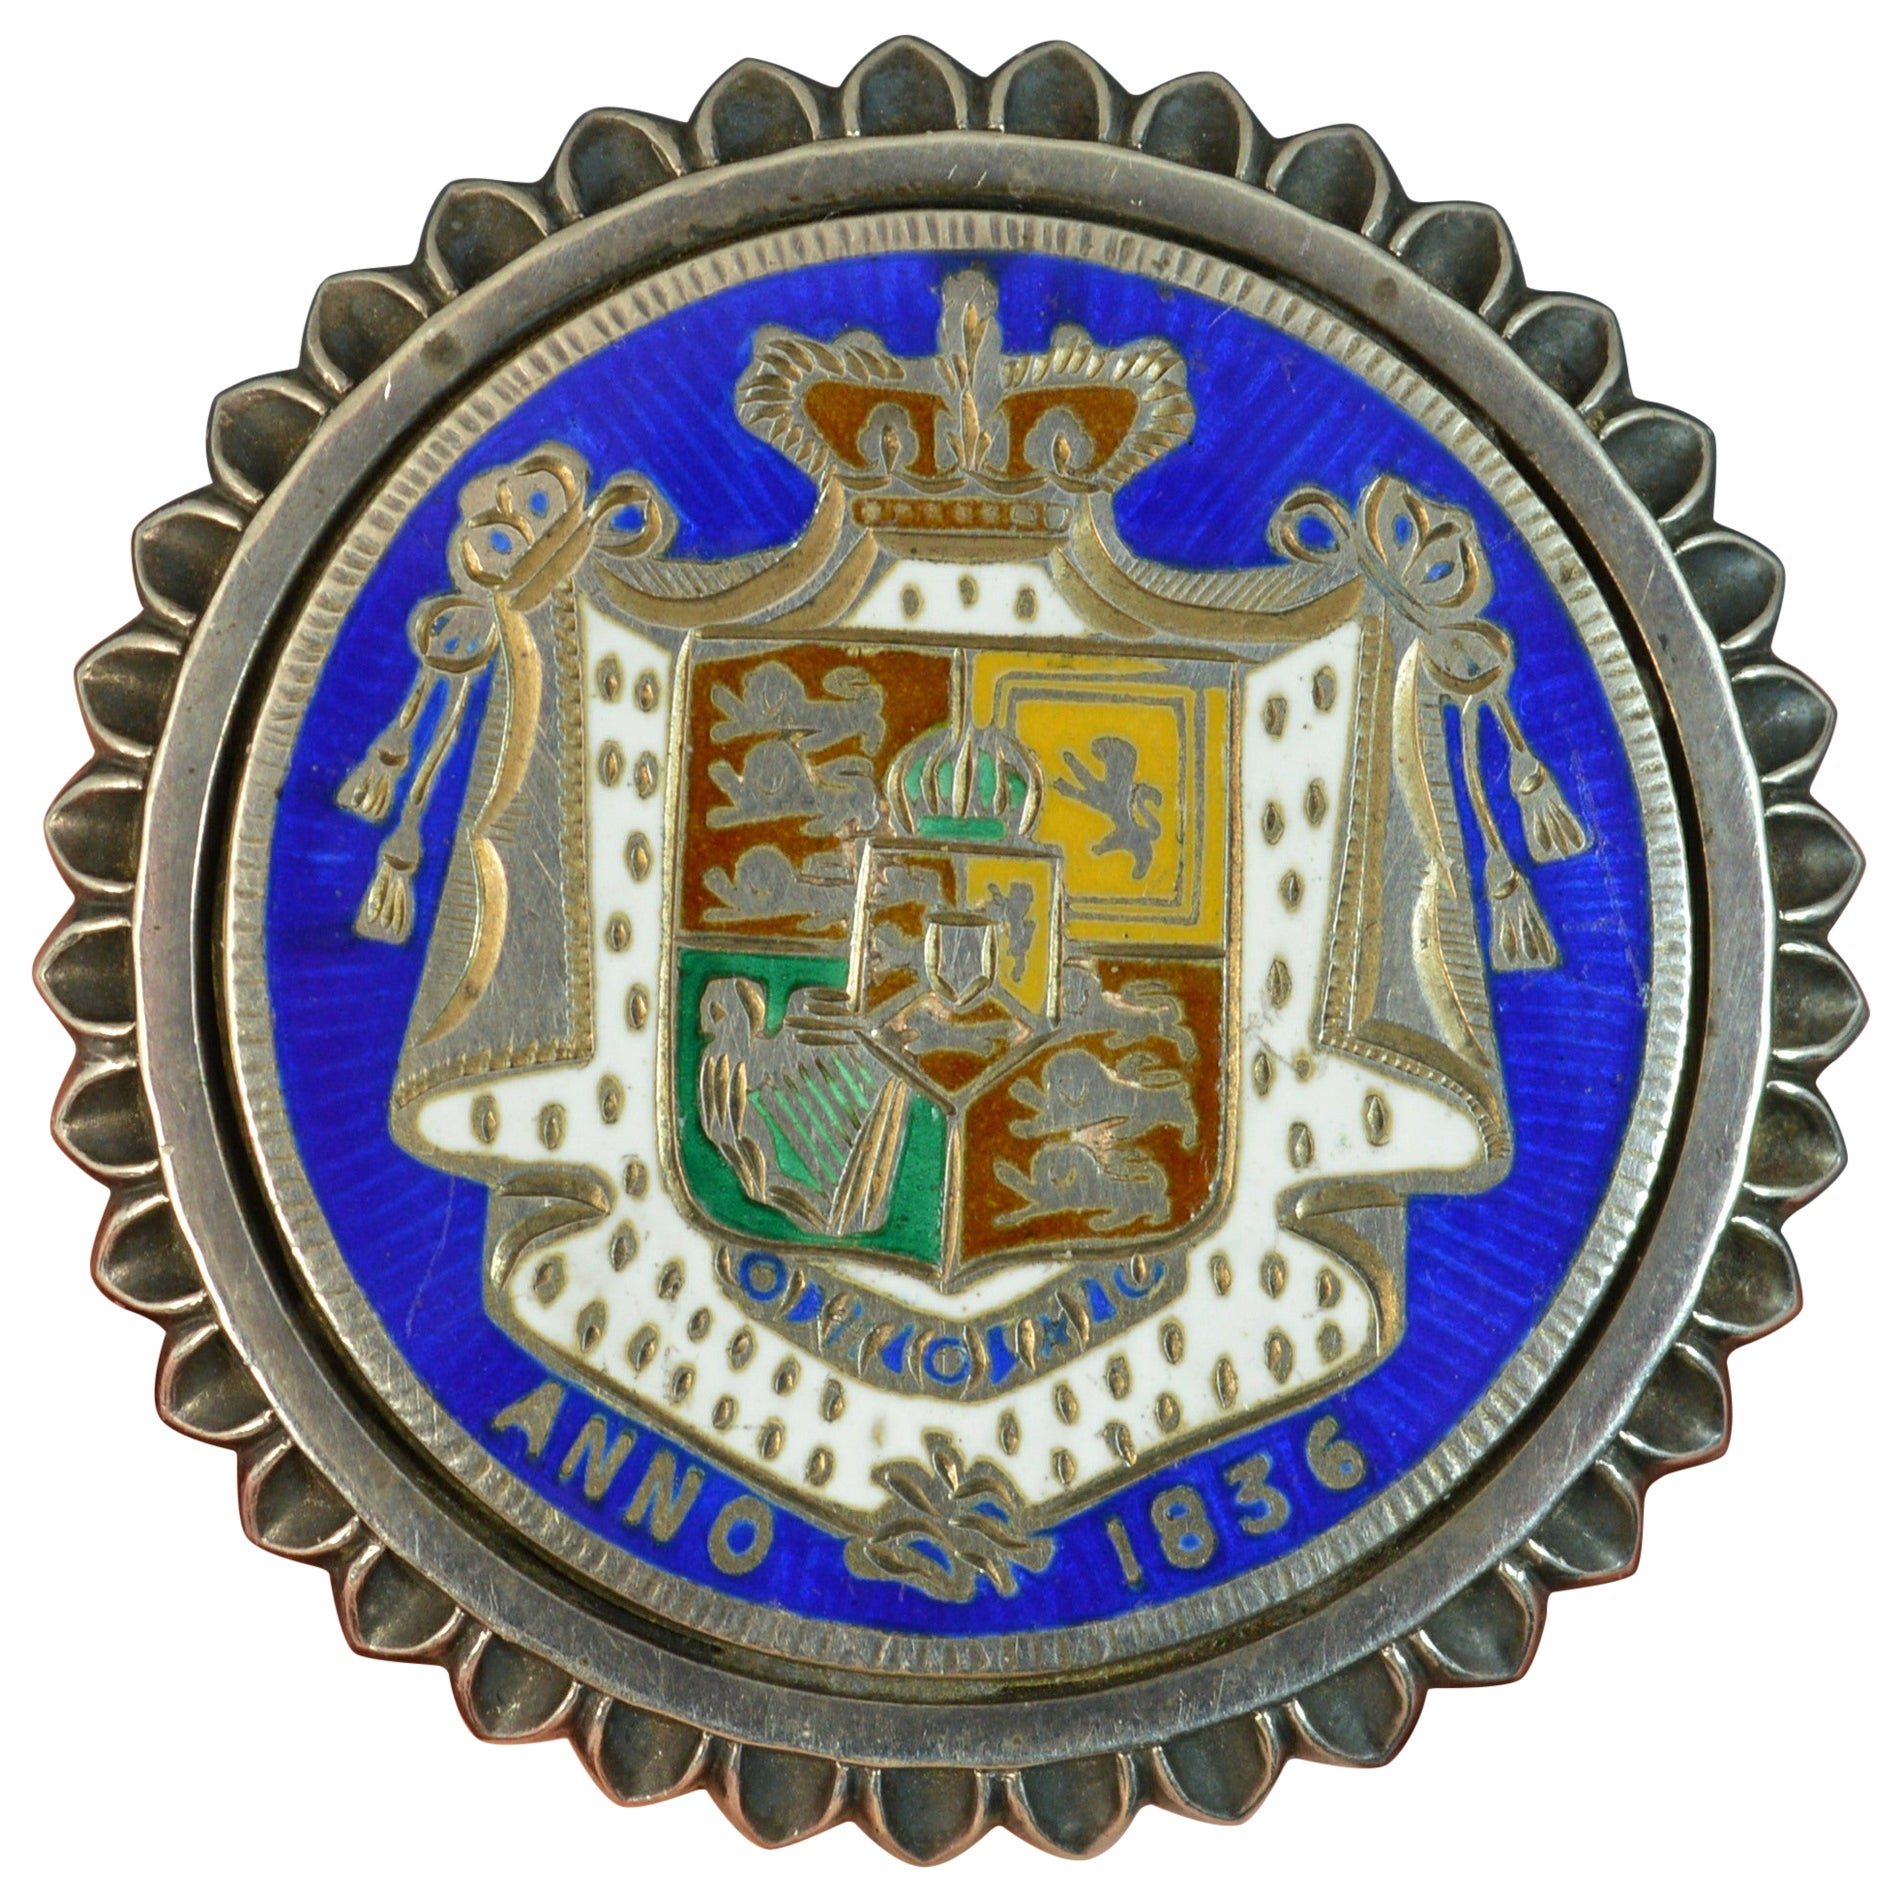 1836 William IV Half Crown Sterling Silver and Enamel Locket Brooch